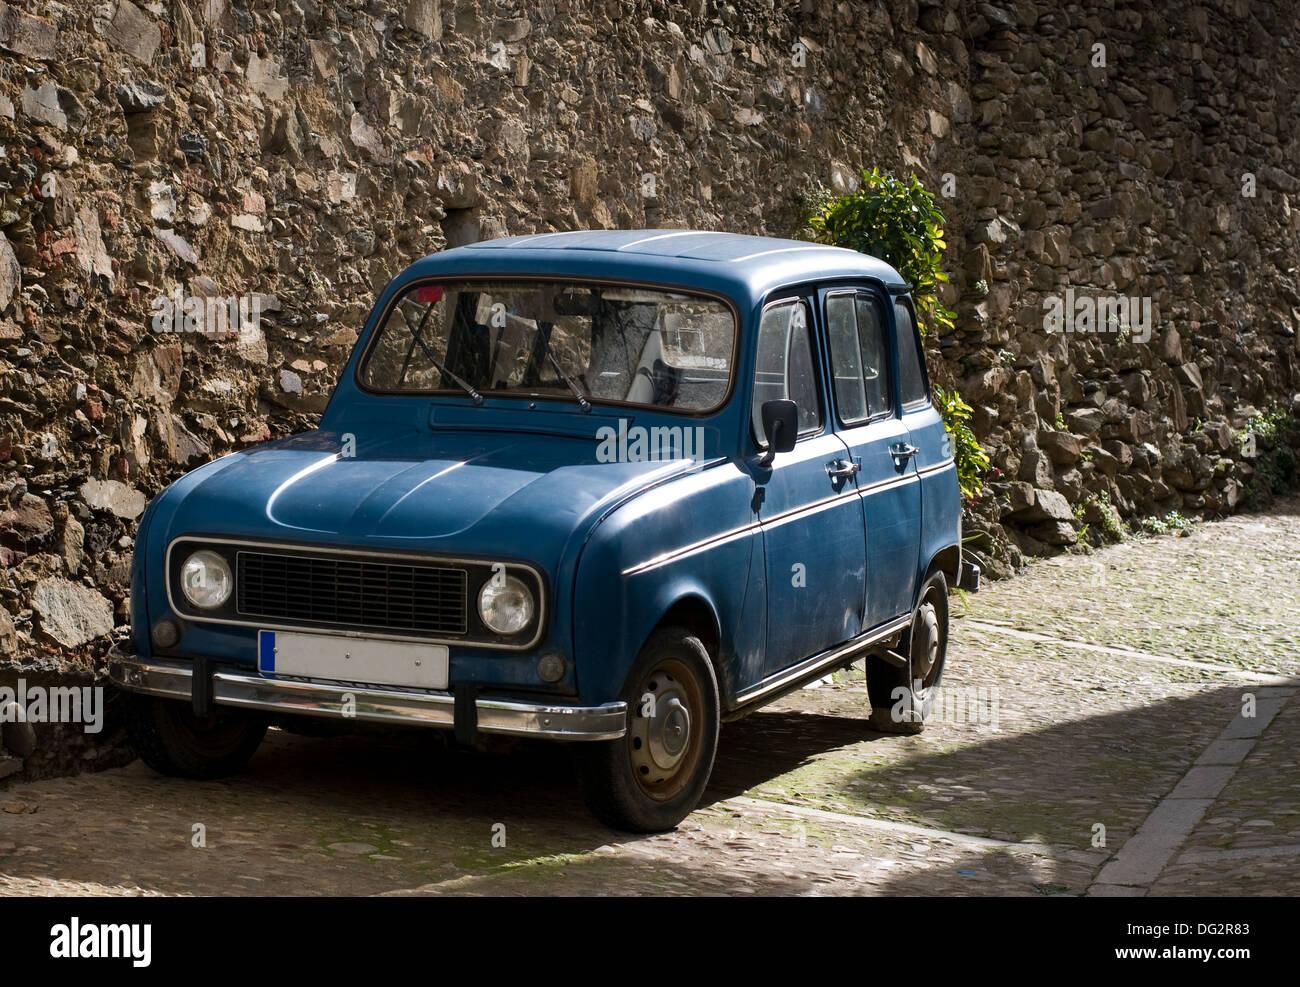 Antique auto blu in ambiente rurale. Immagini Stock